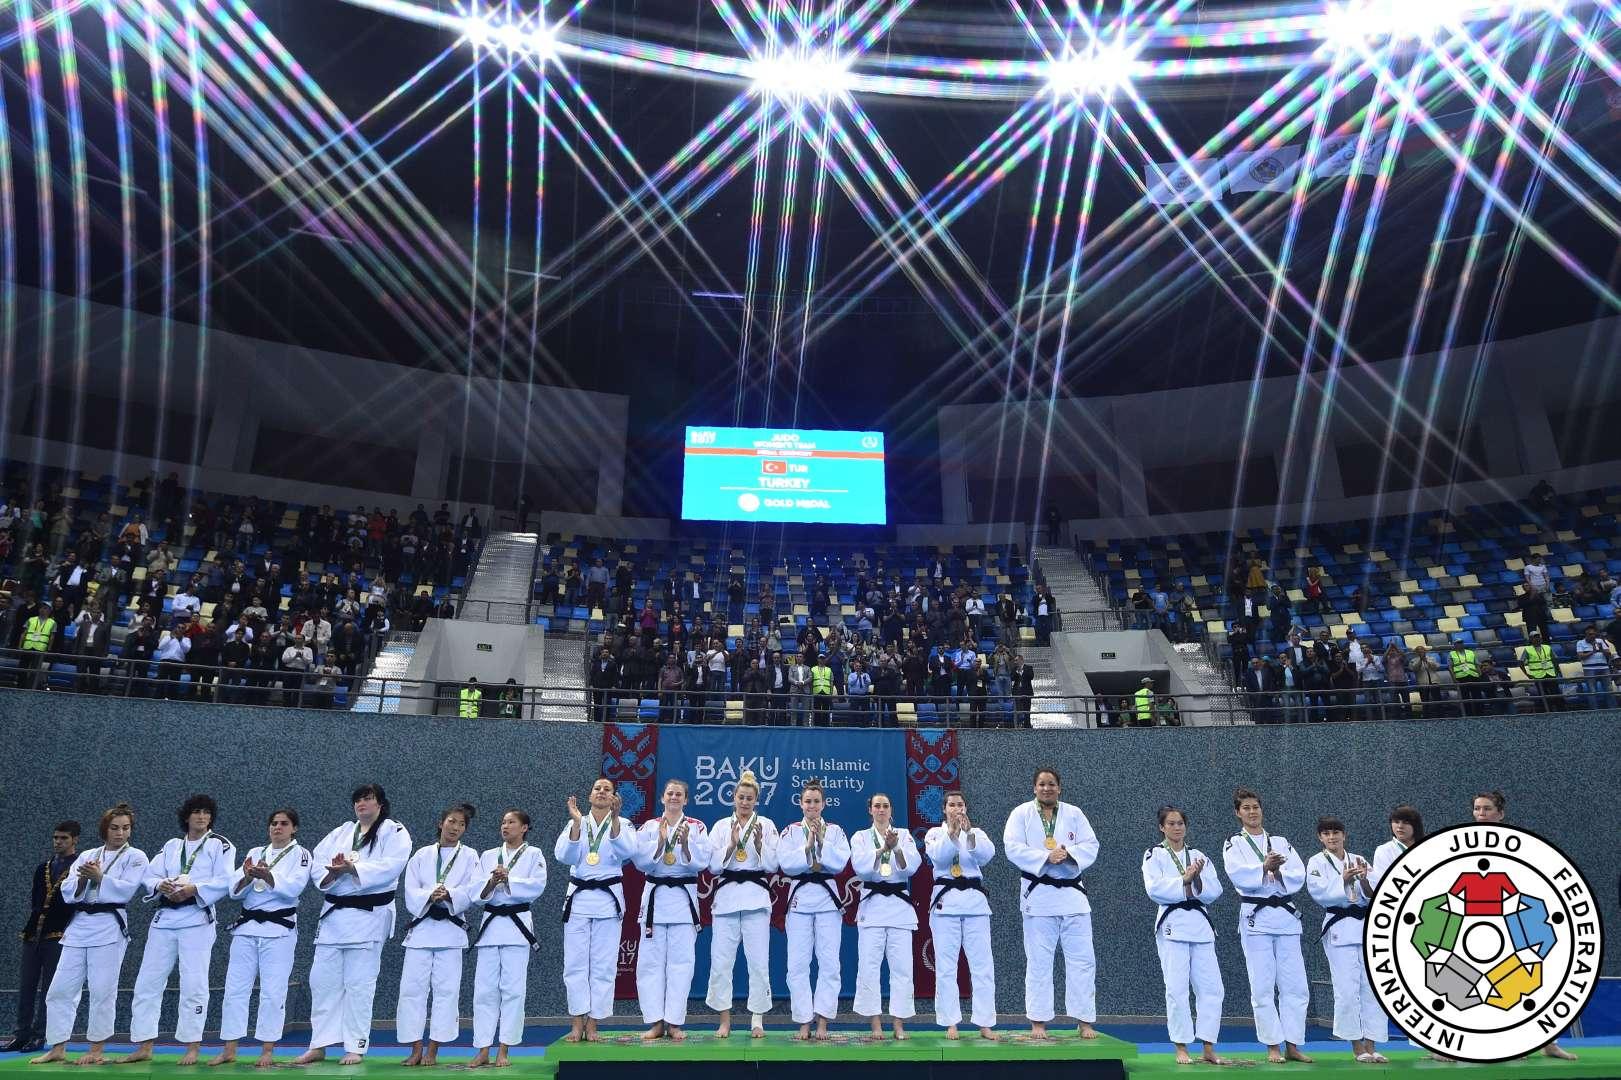 JudoTurkey - Islamic Solidarity Games, Baku 2017 – DAY THREE